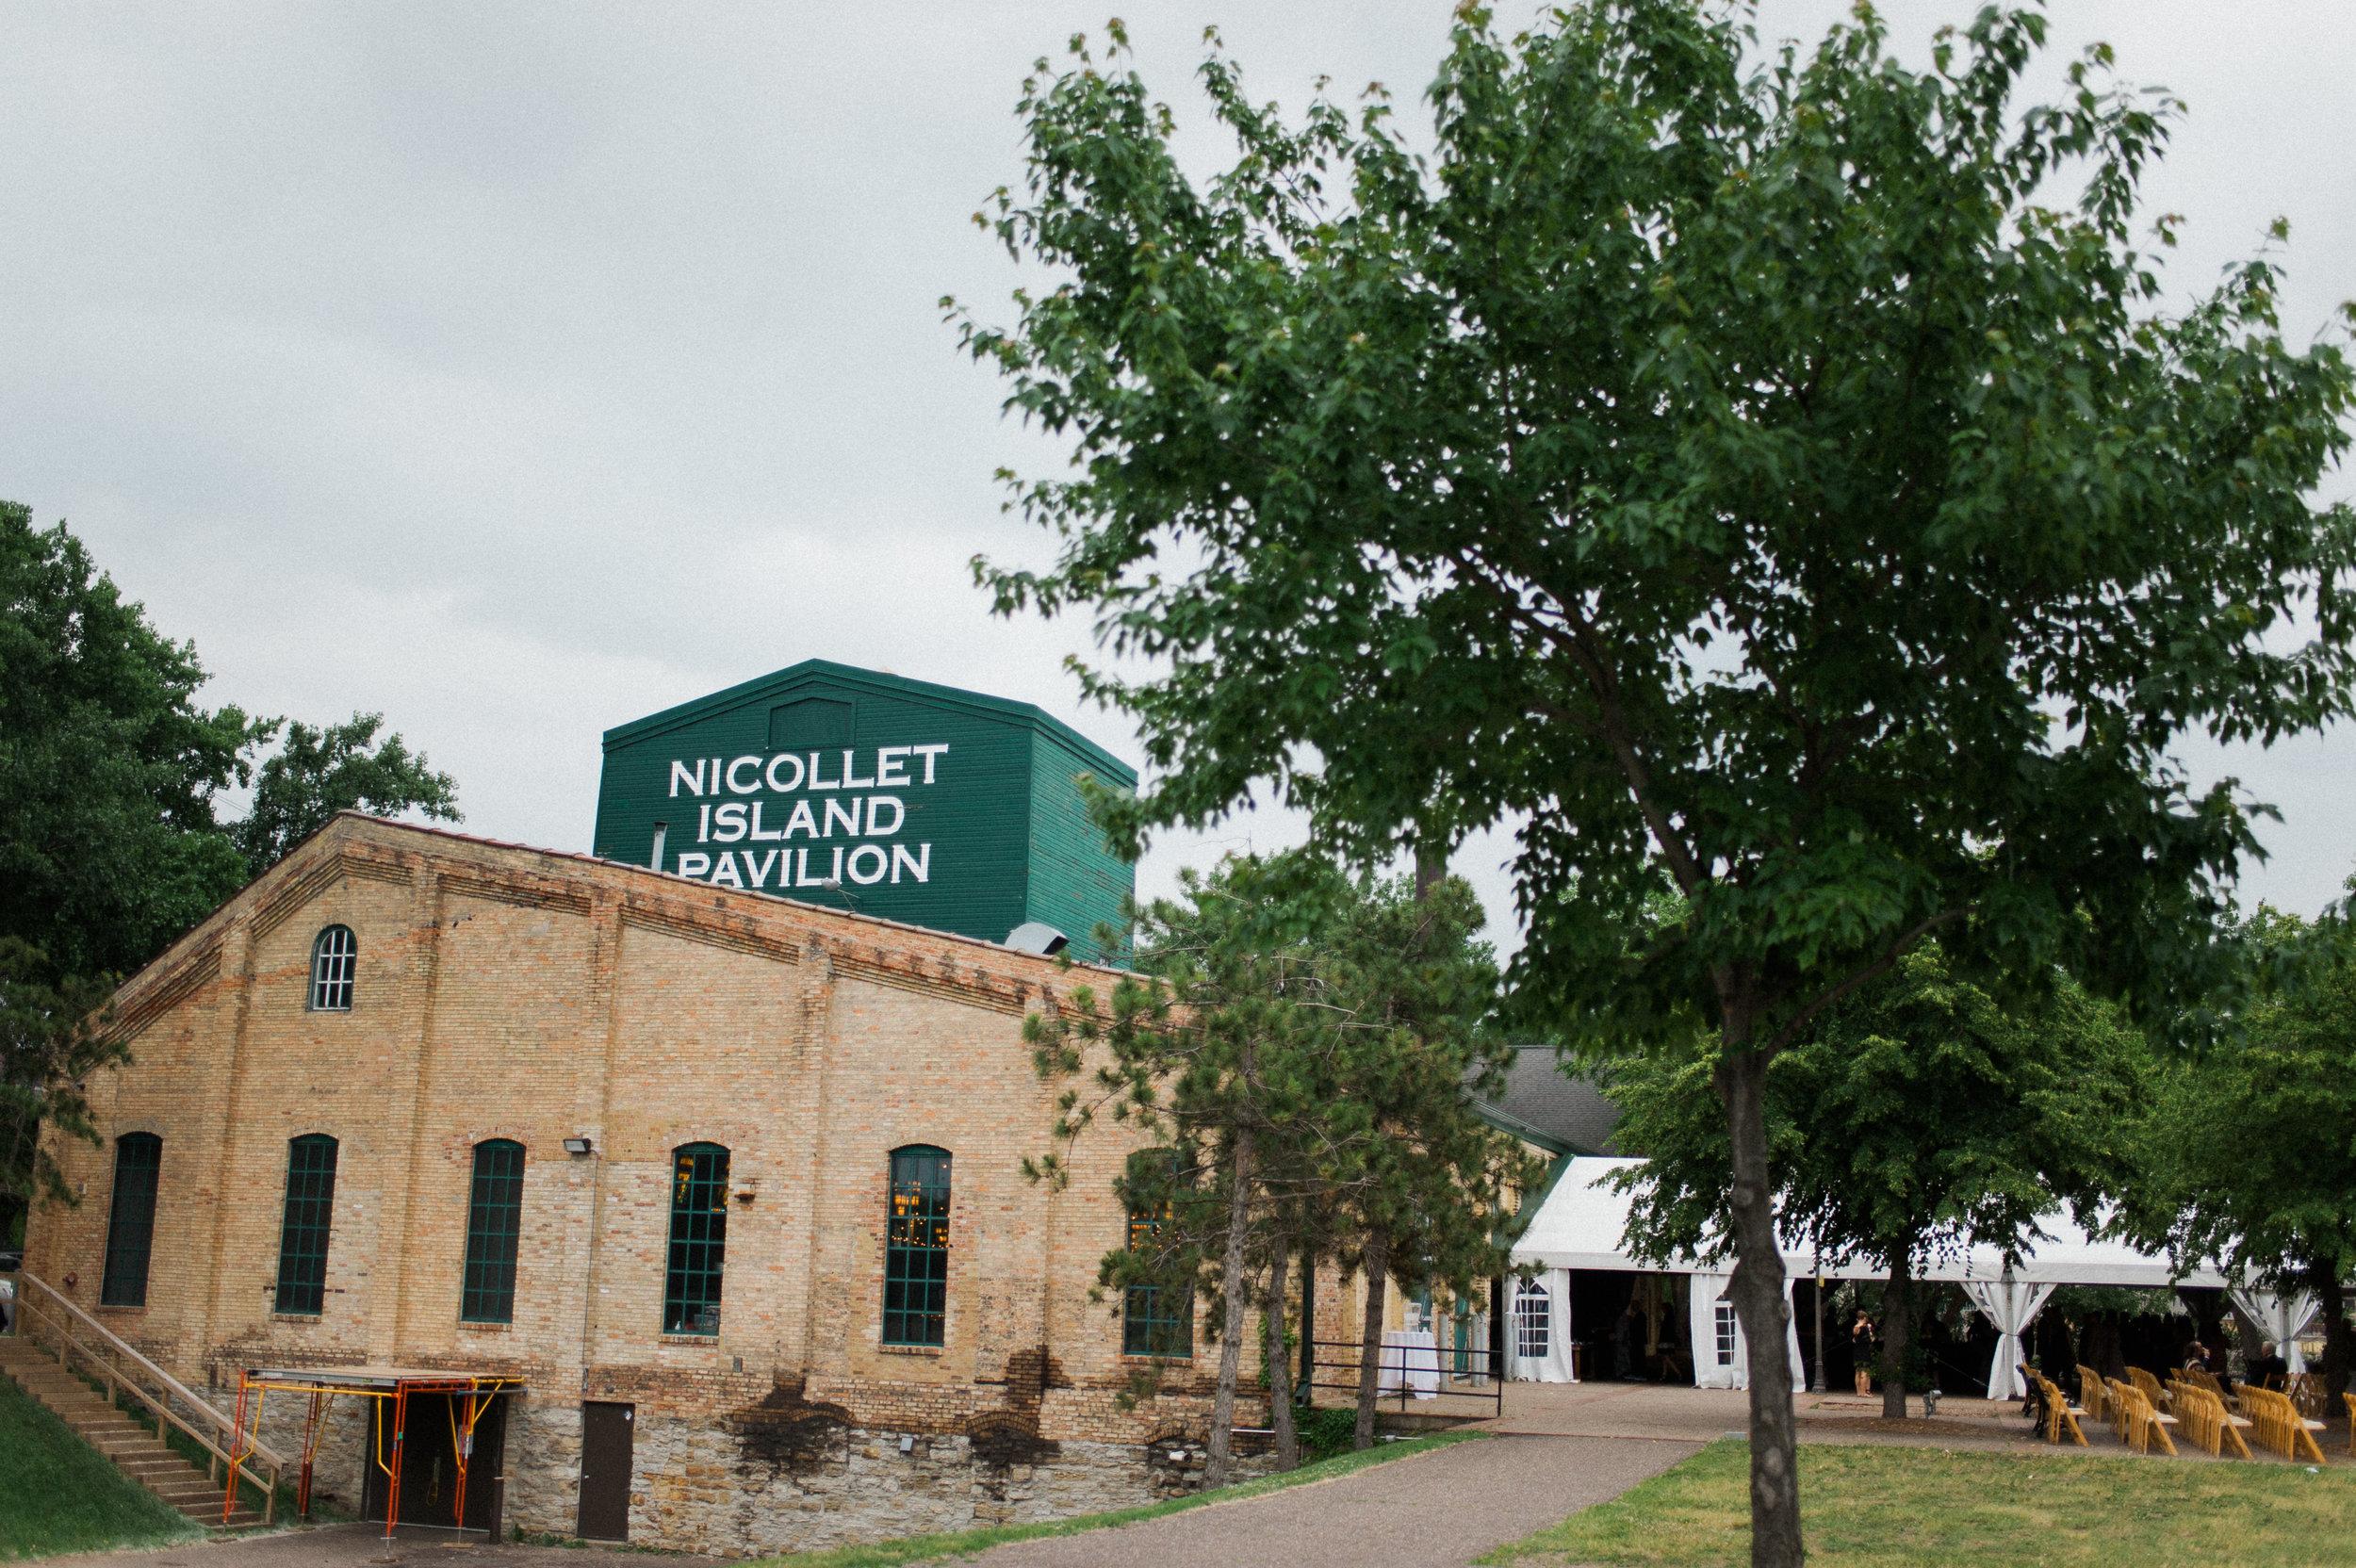 Nicollet-Island-Pavilion-Minneapolis-MN.jpg